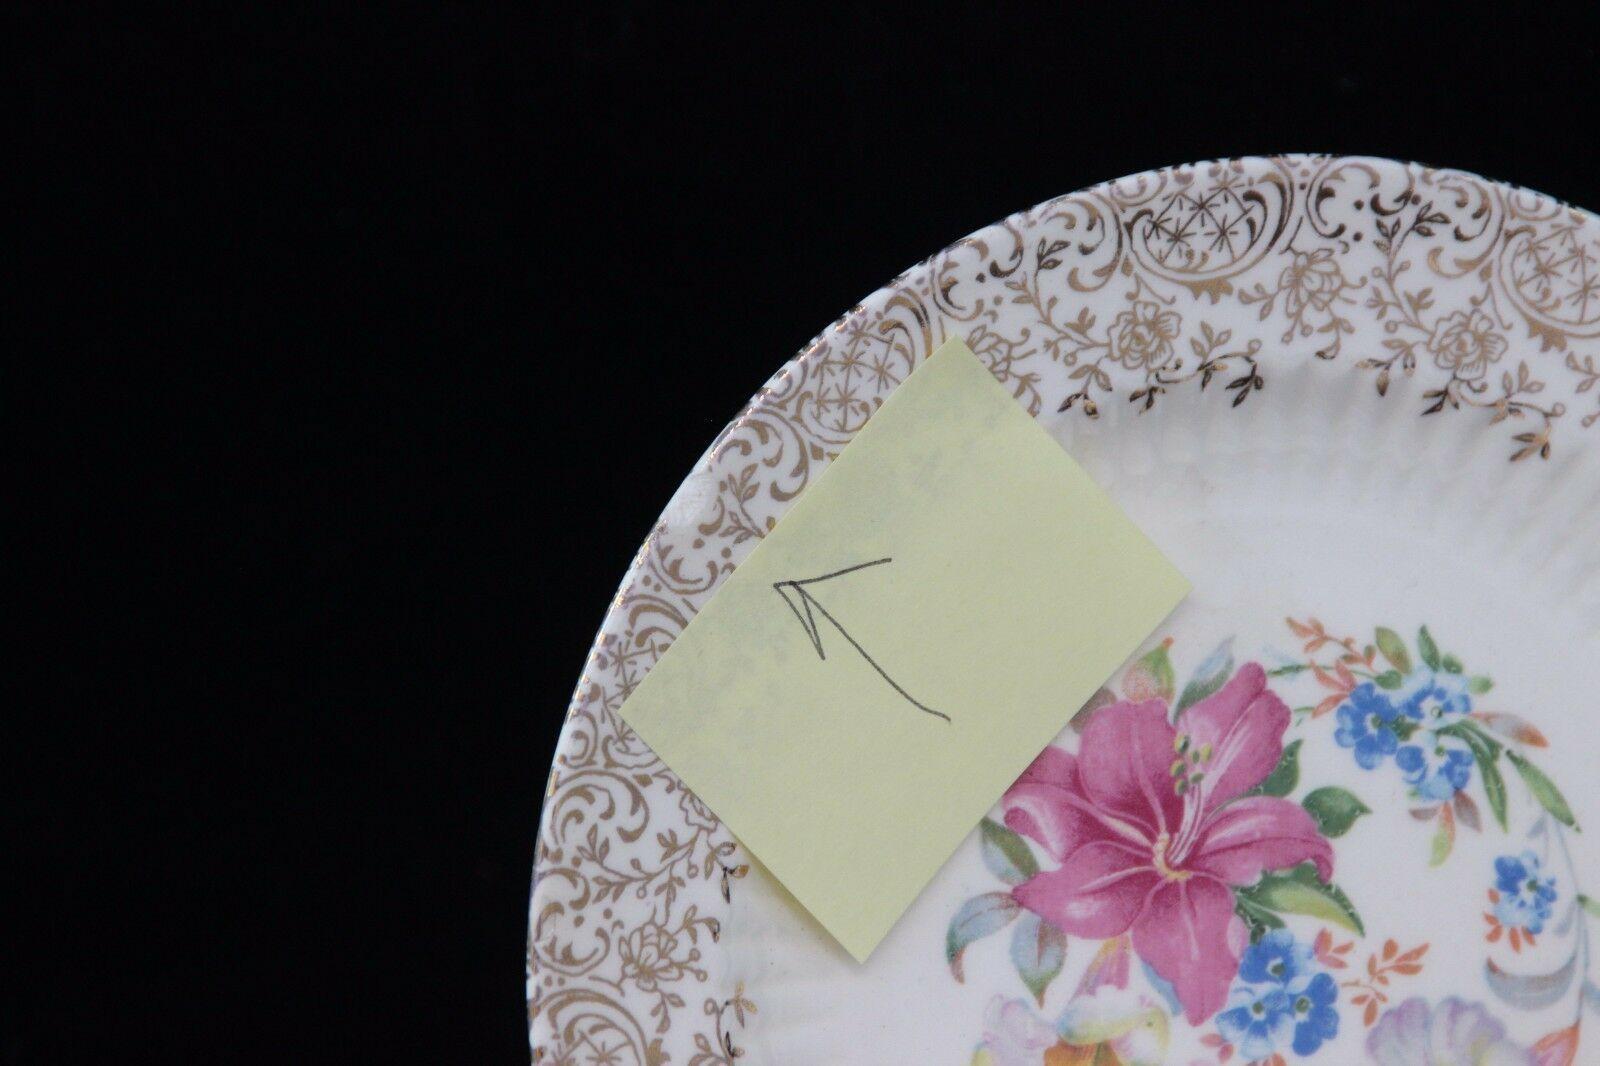 "Sebring Robin Hood Salad Dessert Plates 6-1/4"" Set of 4 + 2 image 2"